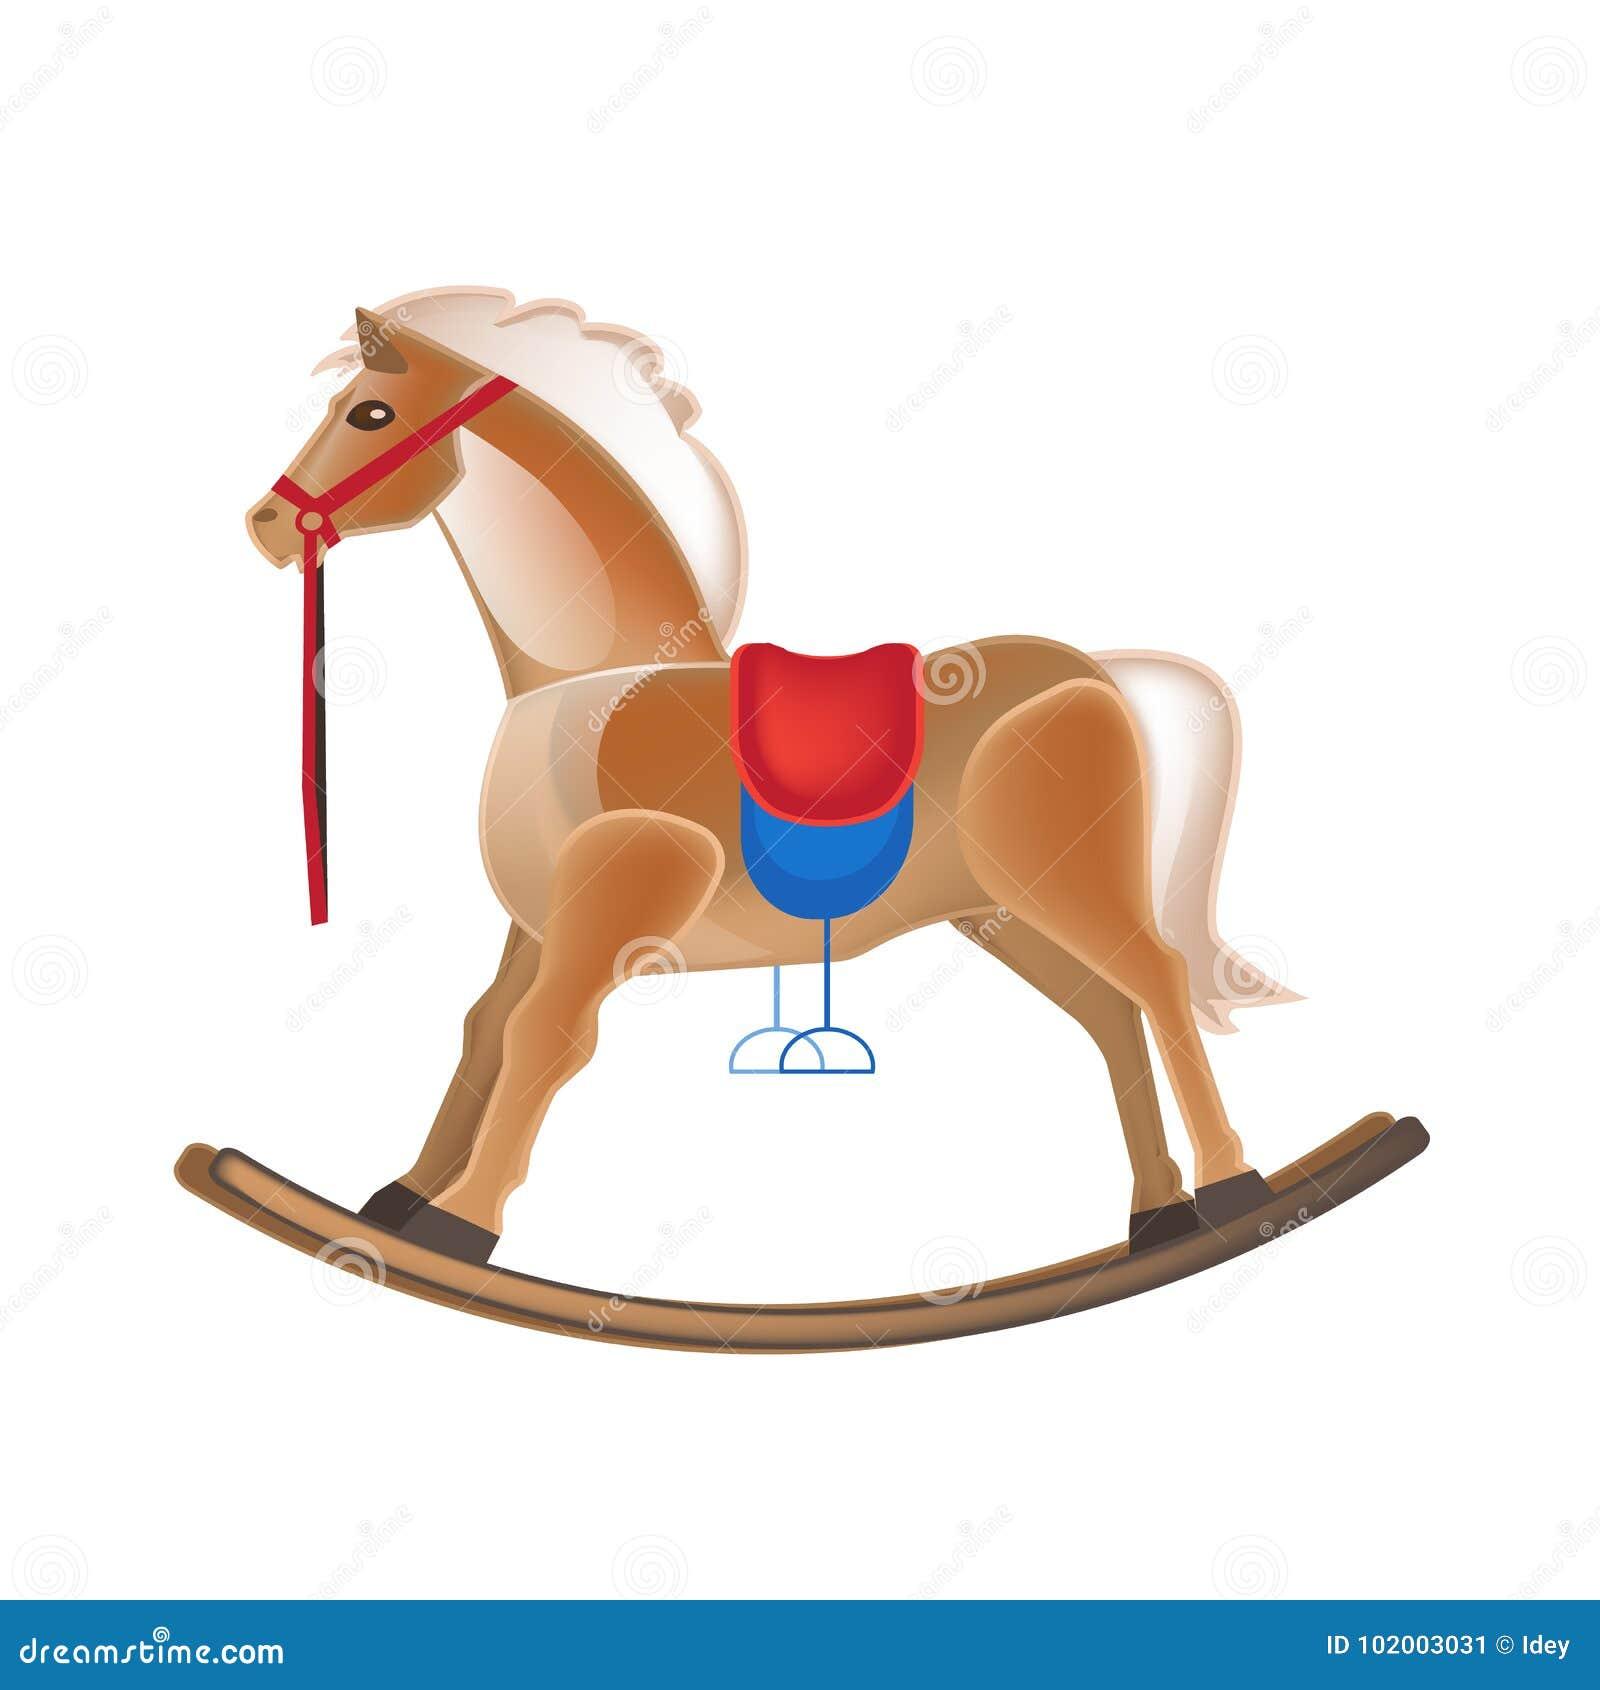 Juguetes coloridos modernos del ` s de los niños Caballo que oscila, entretenimiento, oscilación, carrusel